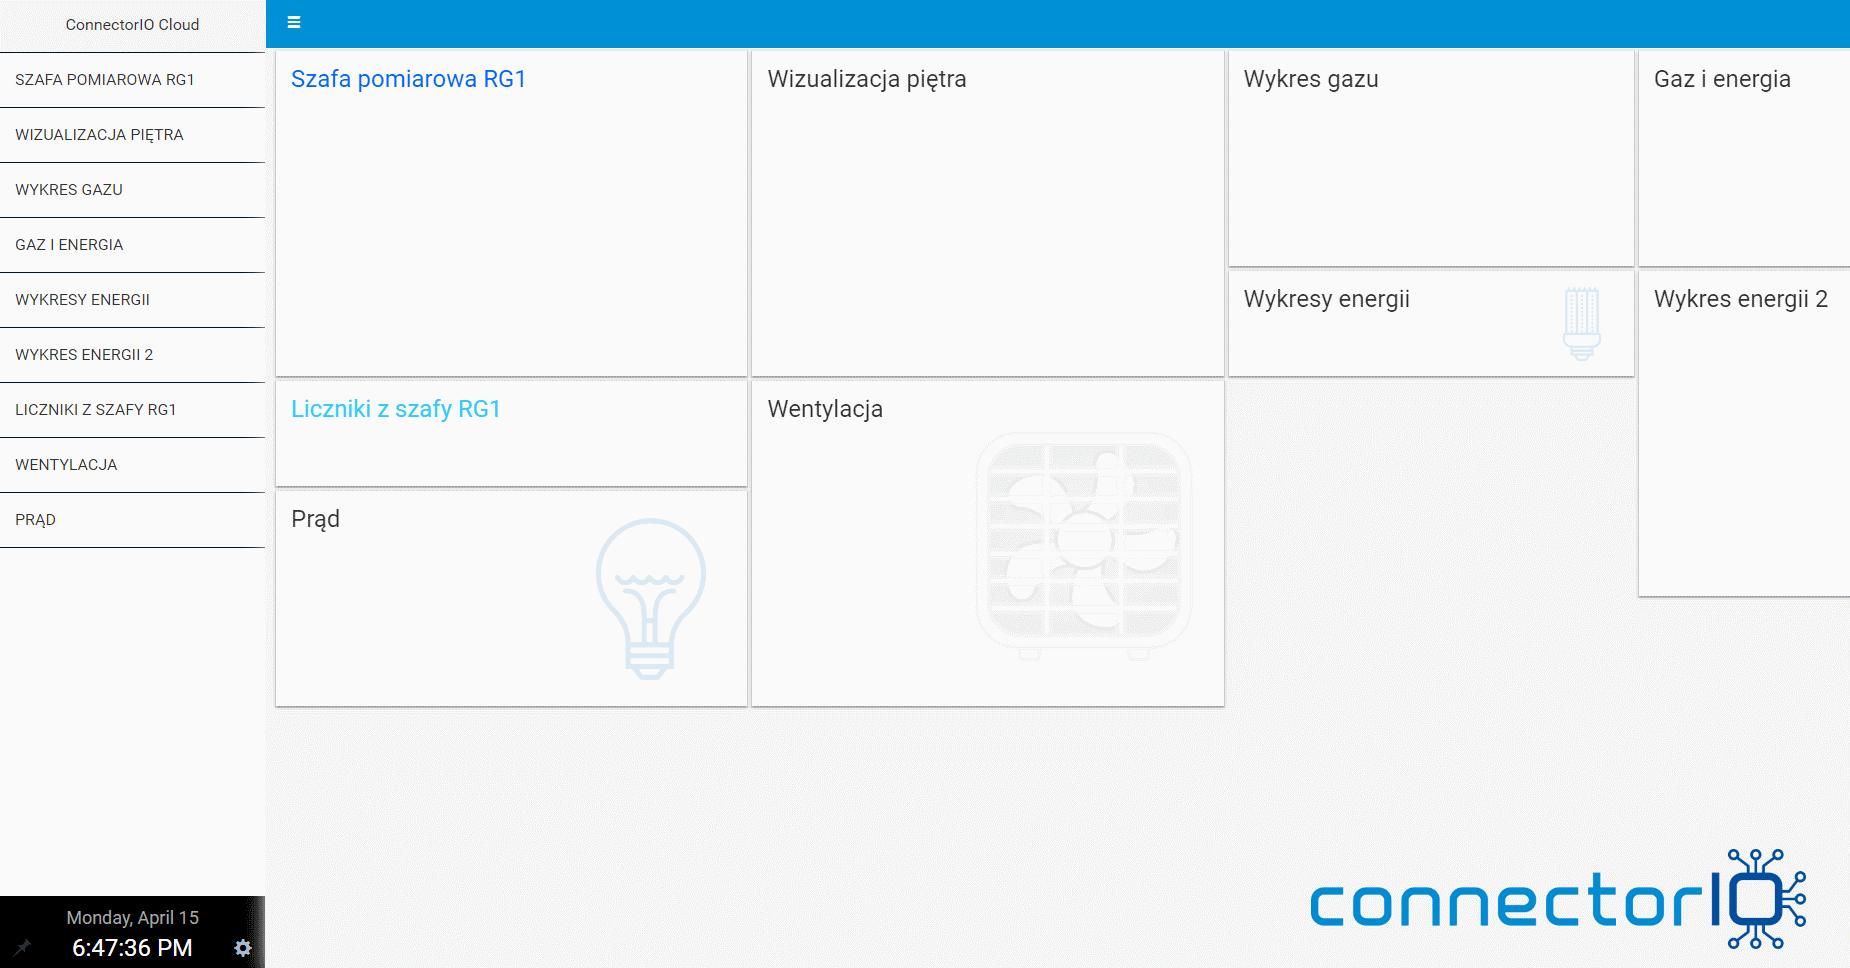 connectorio building automation software dashboard